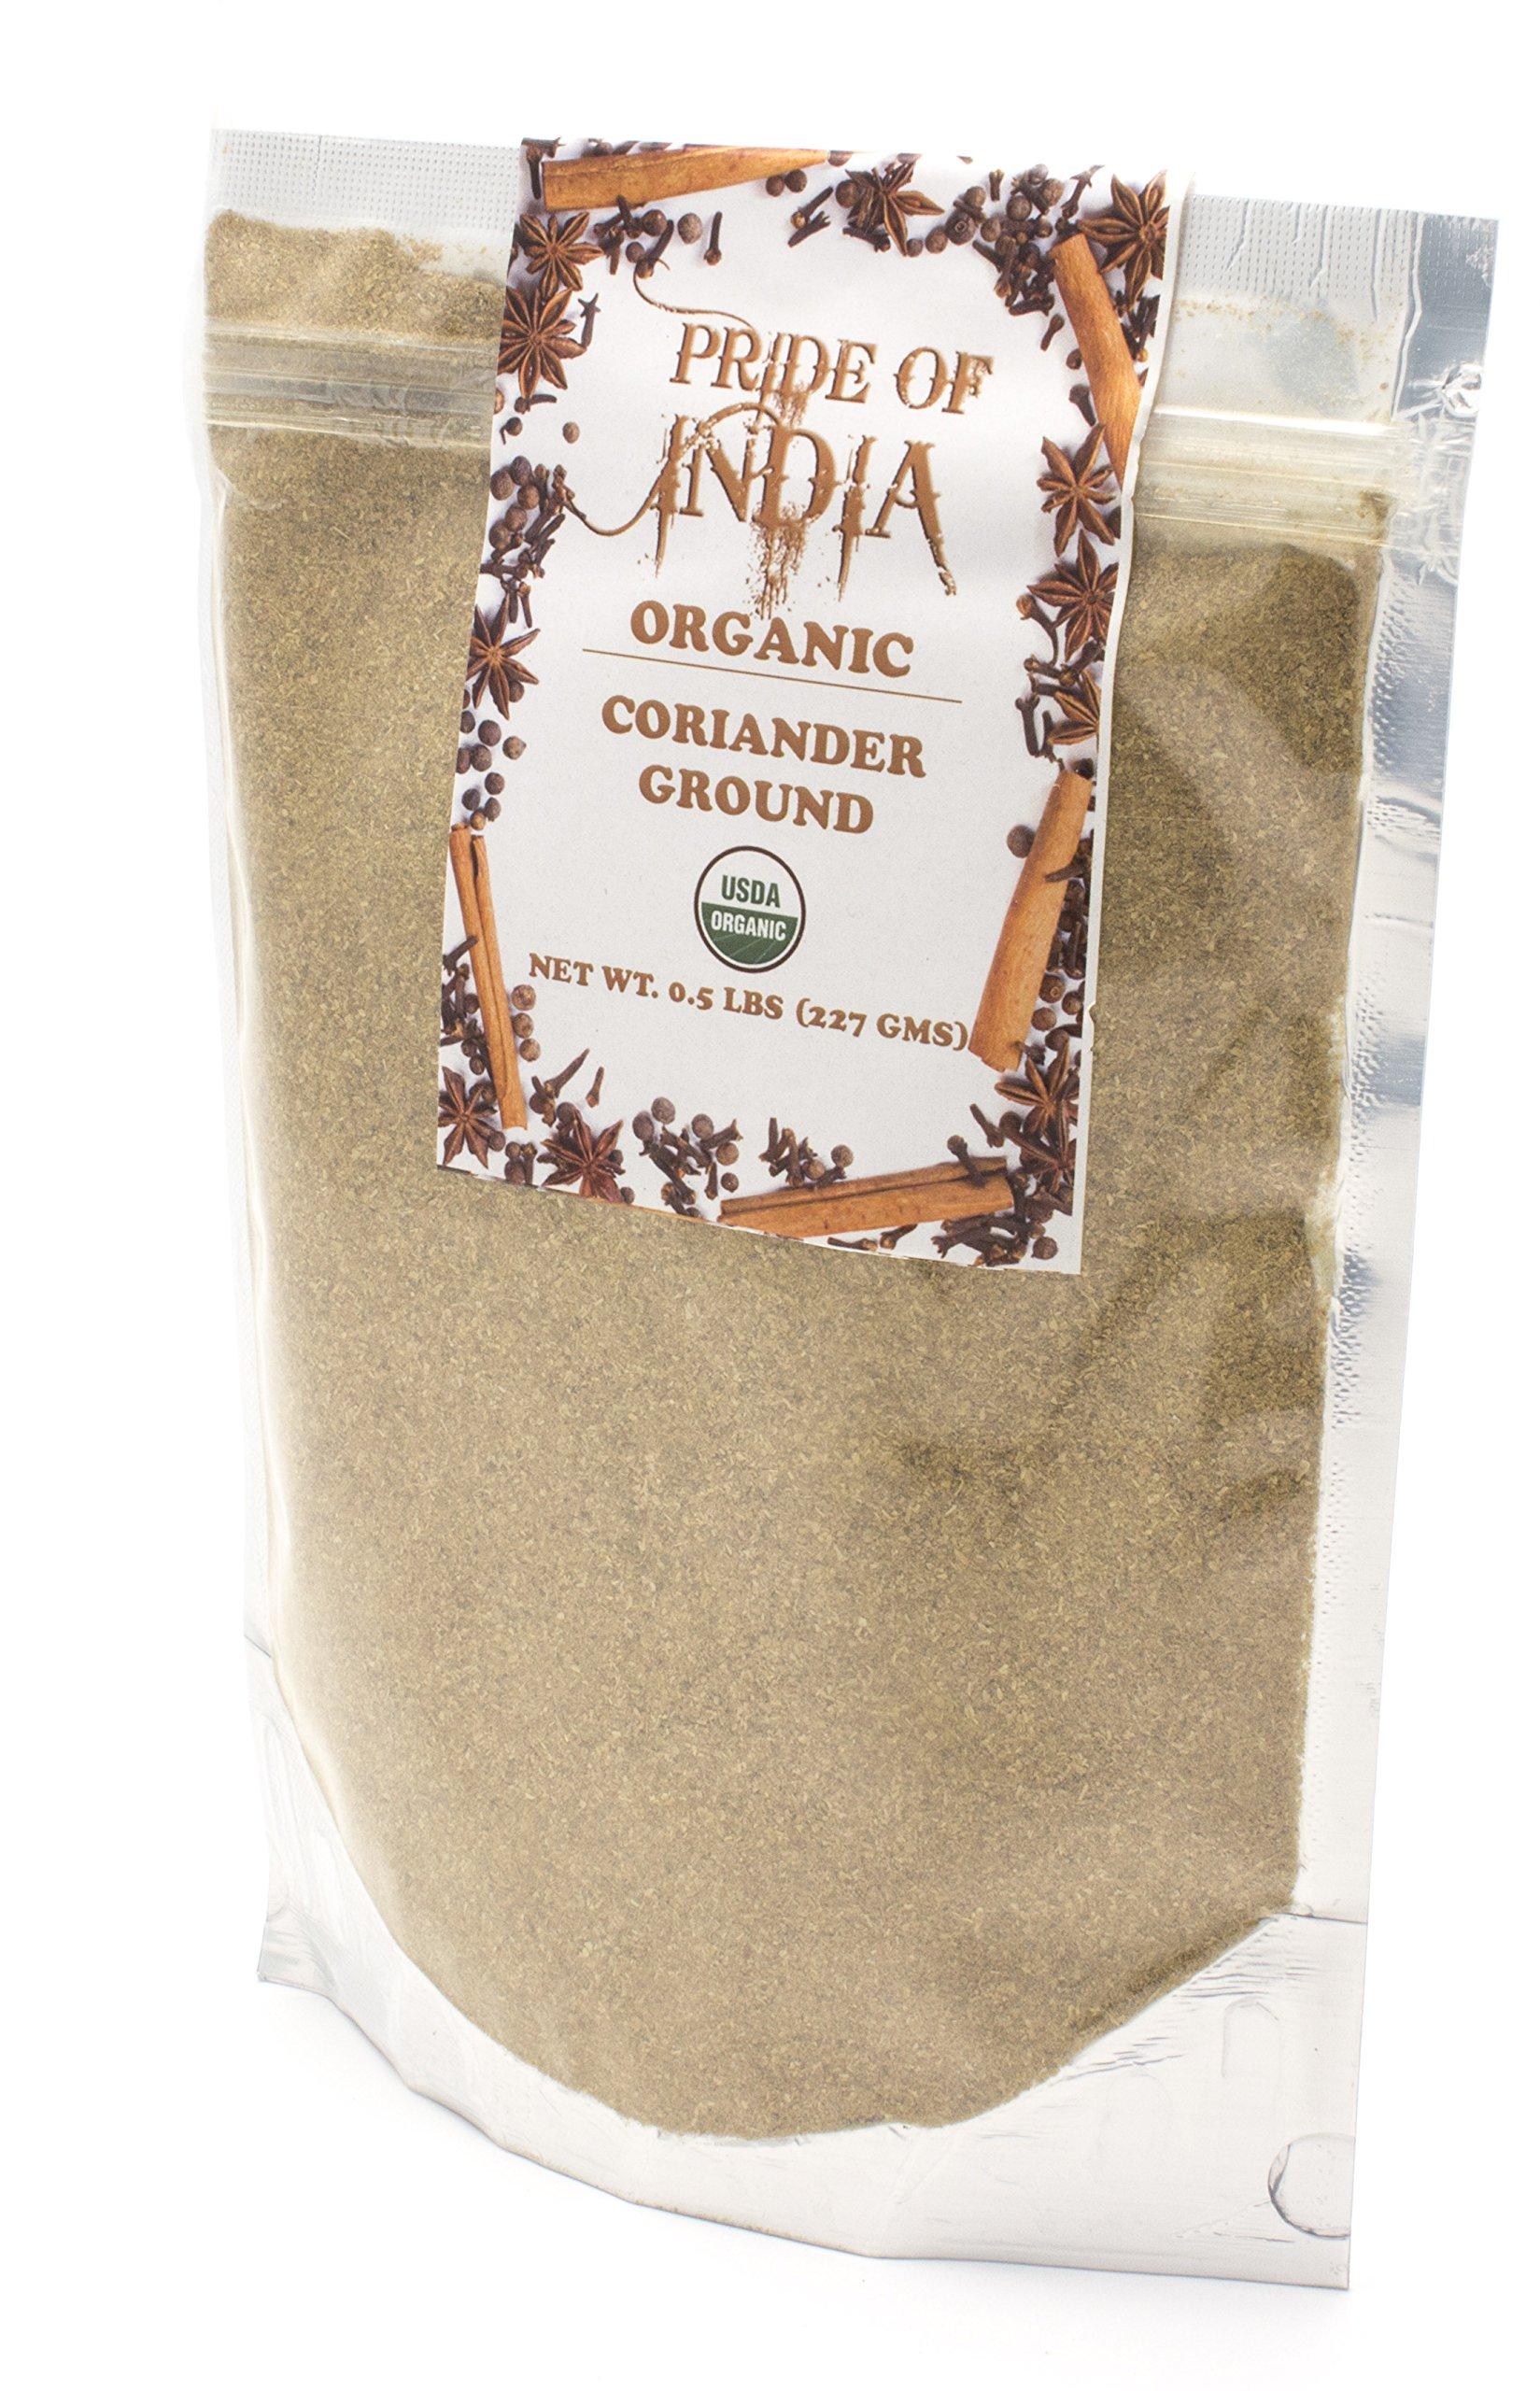 Pride Of India - Organic Coriander Ground, Half Pound